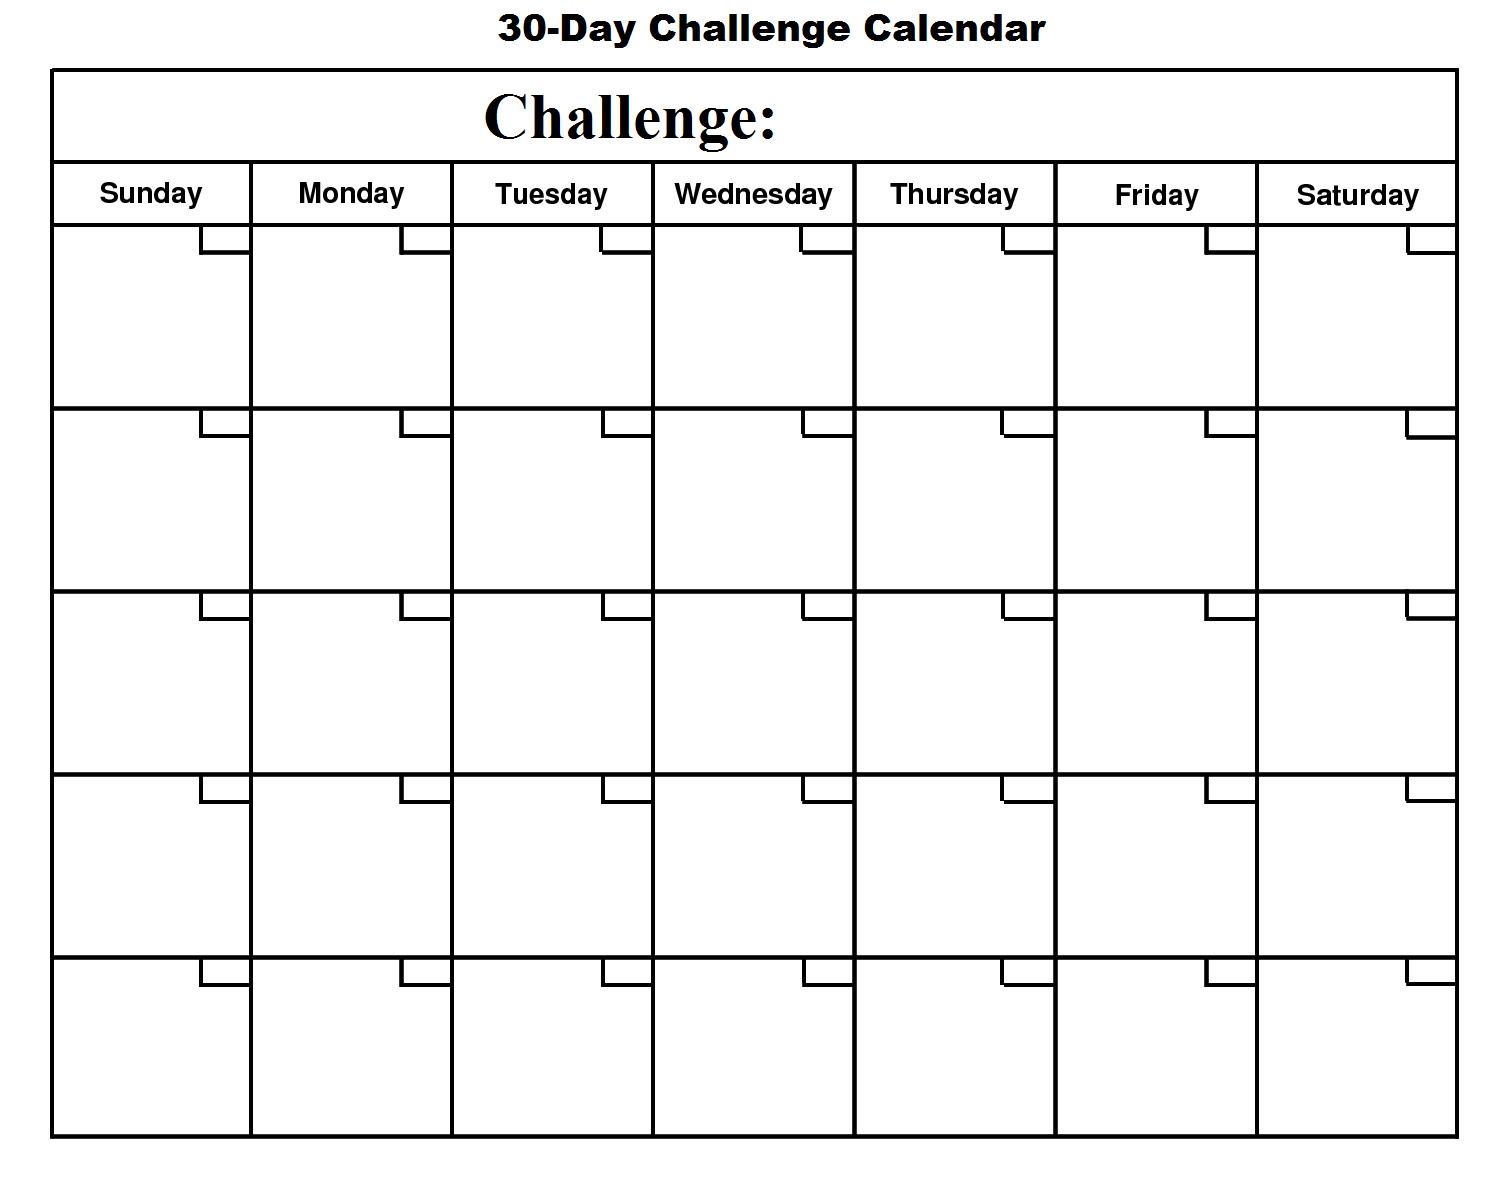 30 Day Calendar - Google Search | Free Calendar Template 21 Day Calendar Template